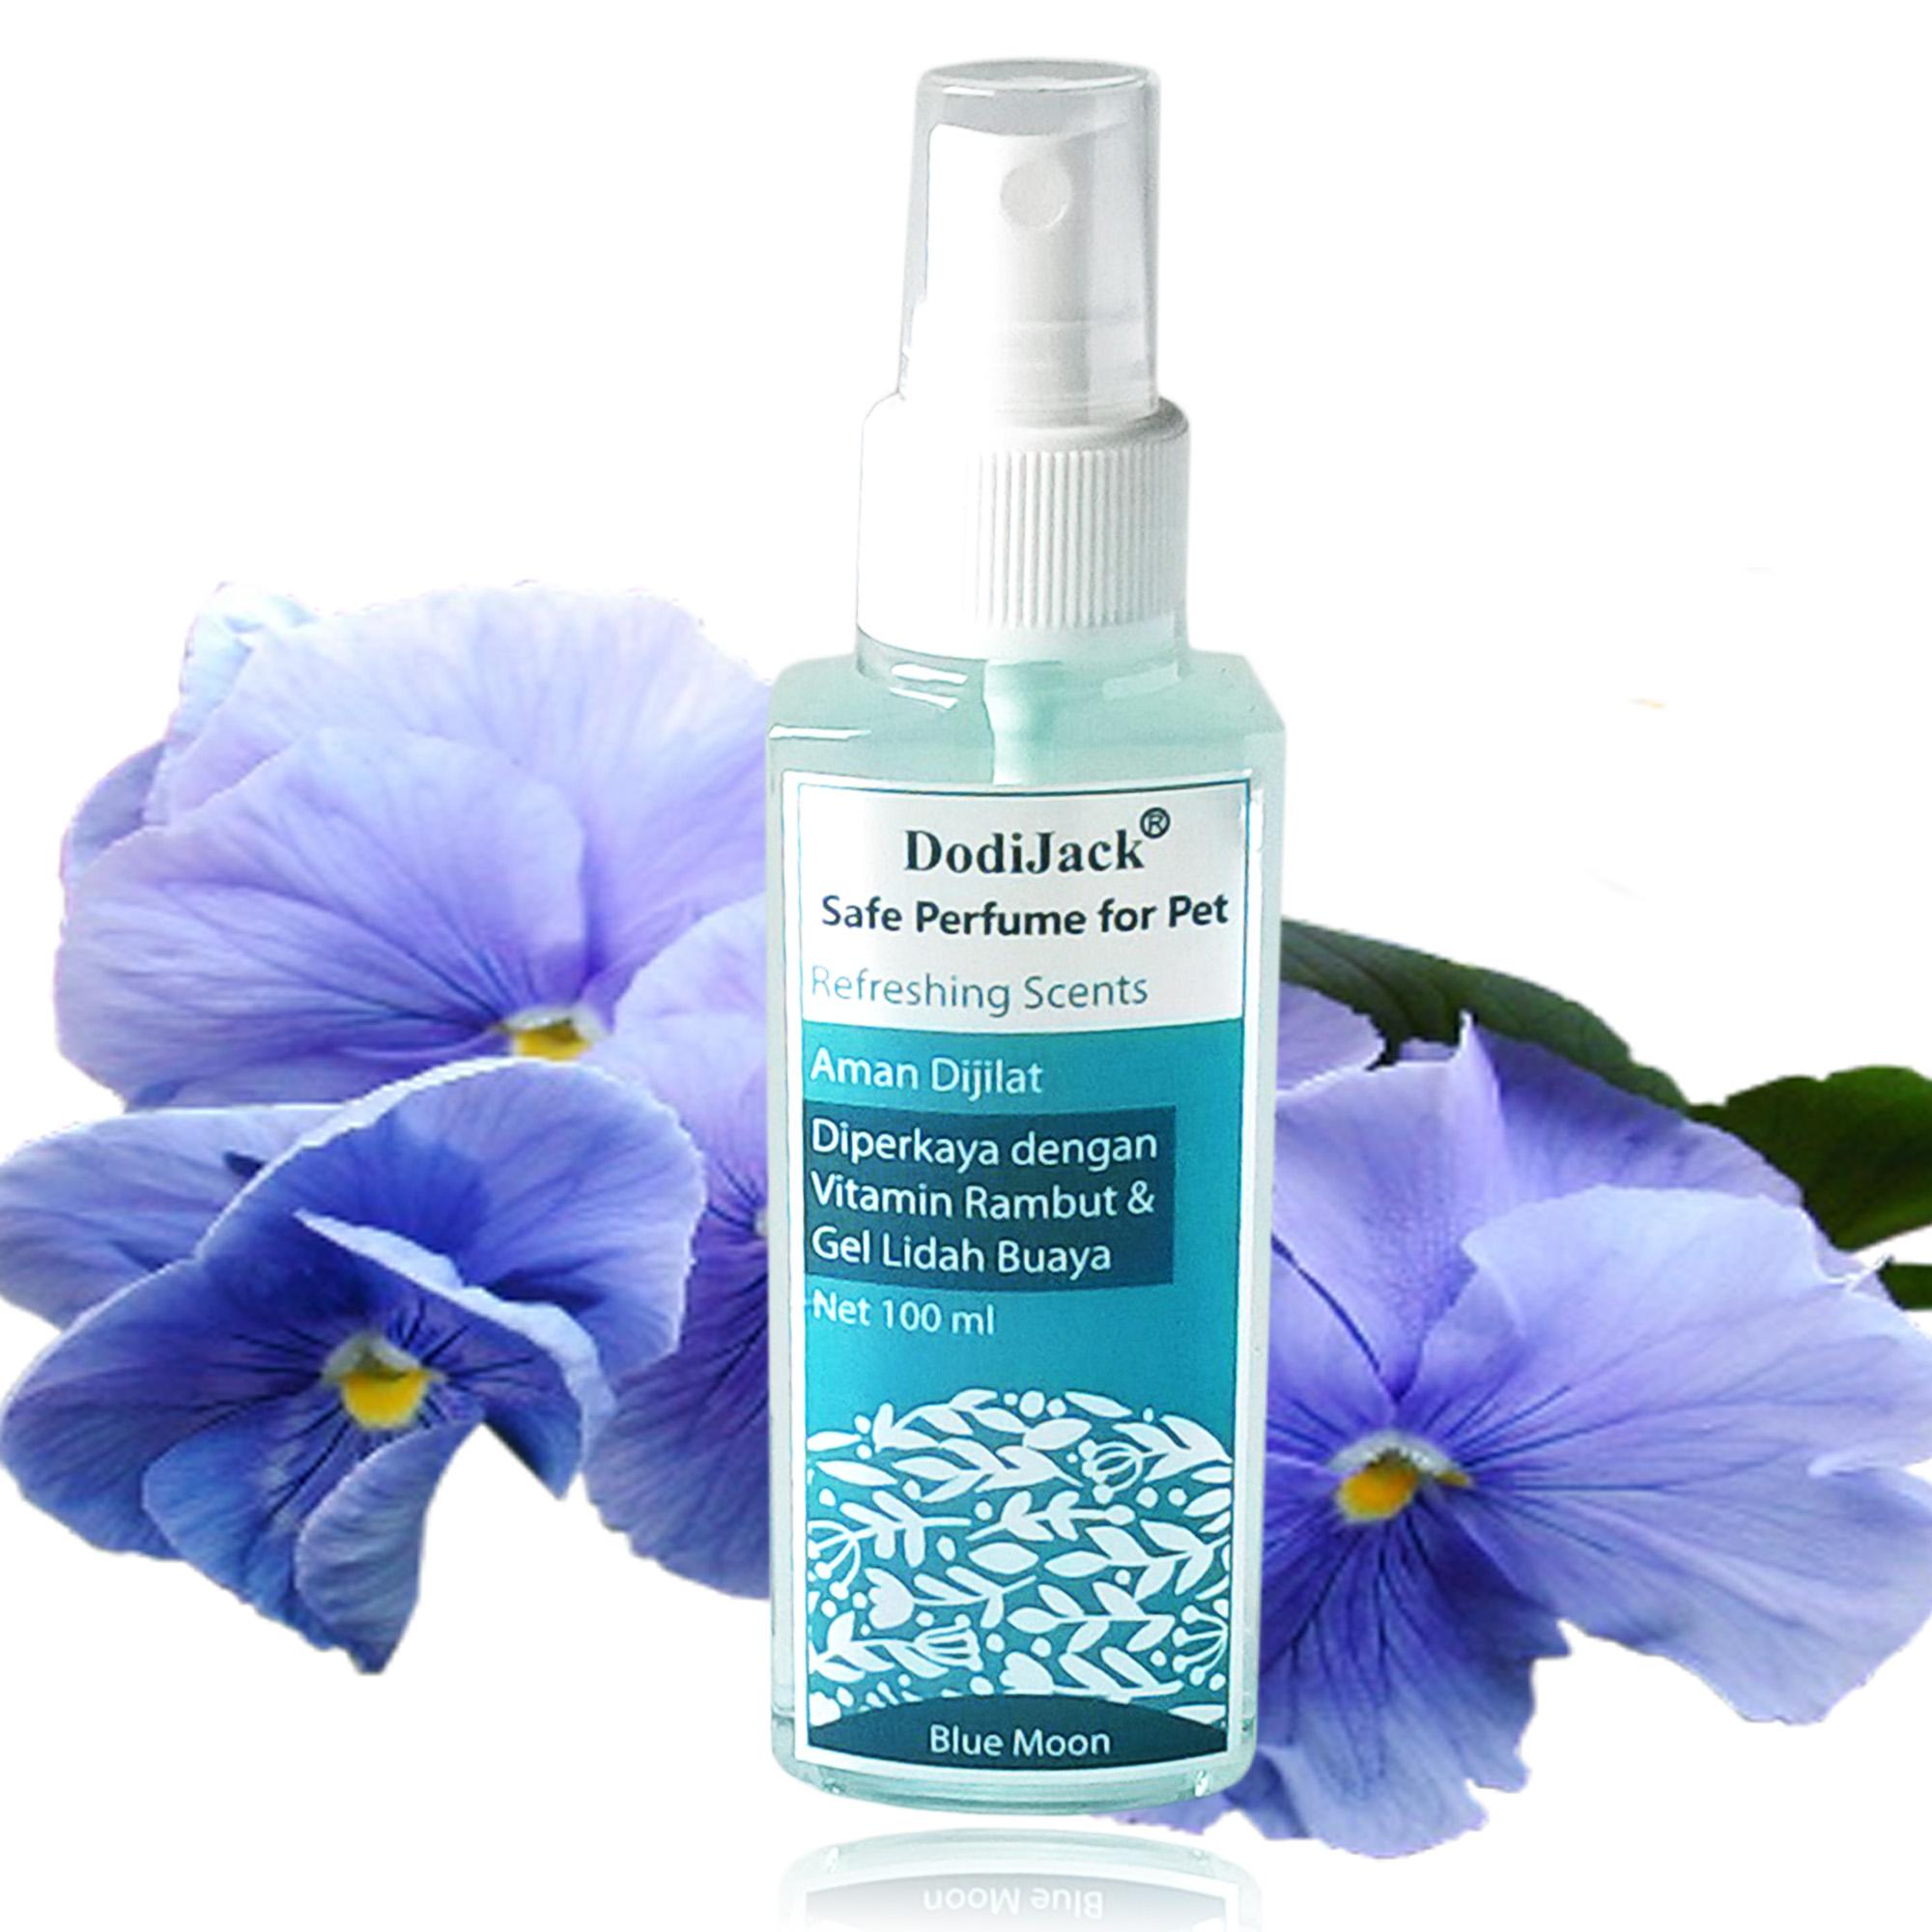 Dodijack Safe Perfume For Pet Parfum Hewan Aroma Mullberry 100 Ml Mustika Putri Body Spray Cologne Flower Bouquet Jual Blue Moon 100ml Ozoradesign